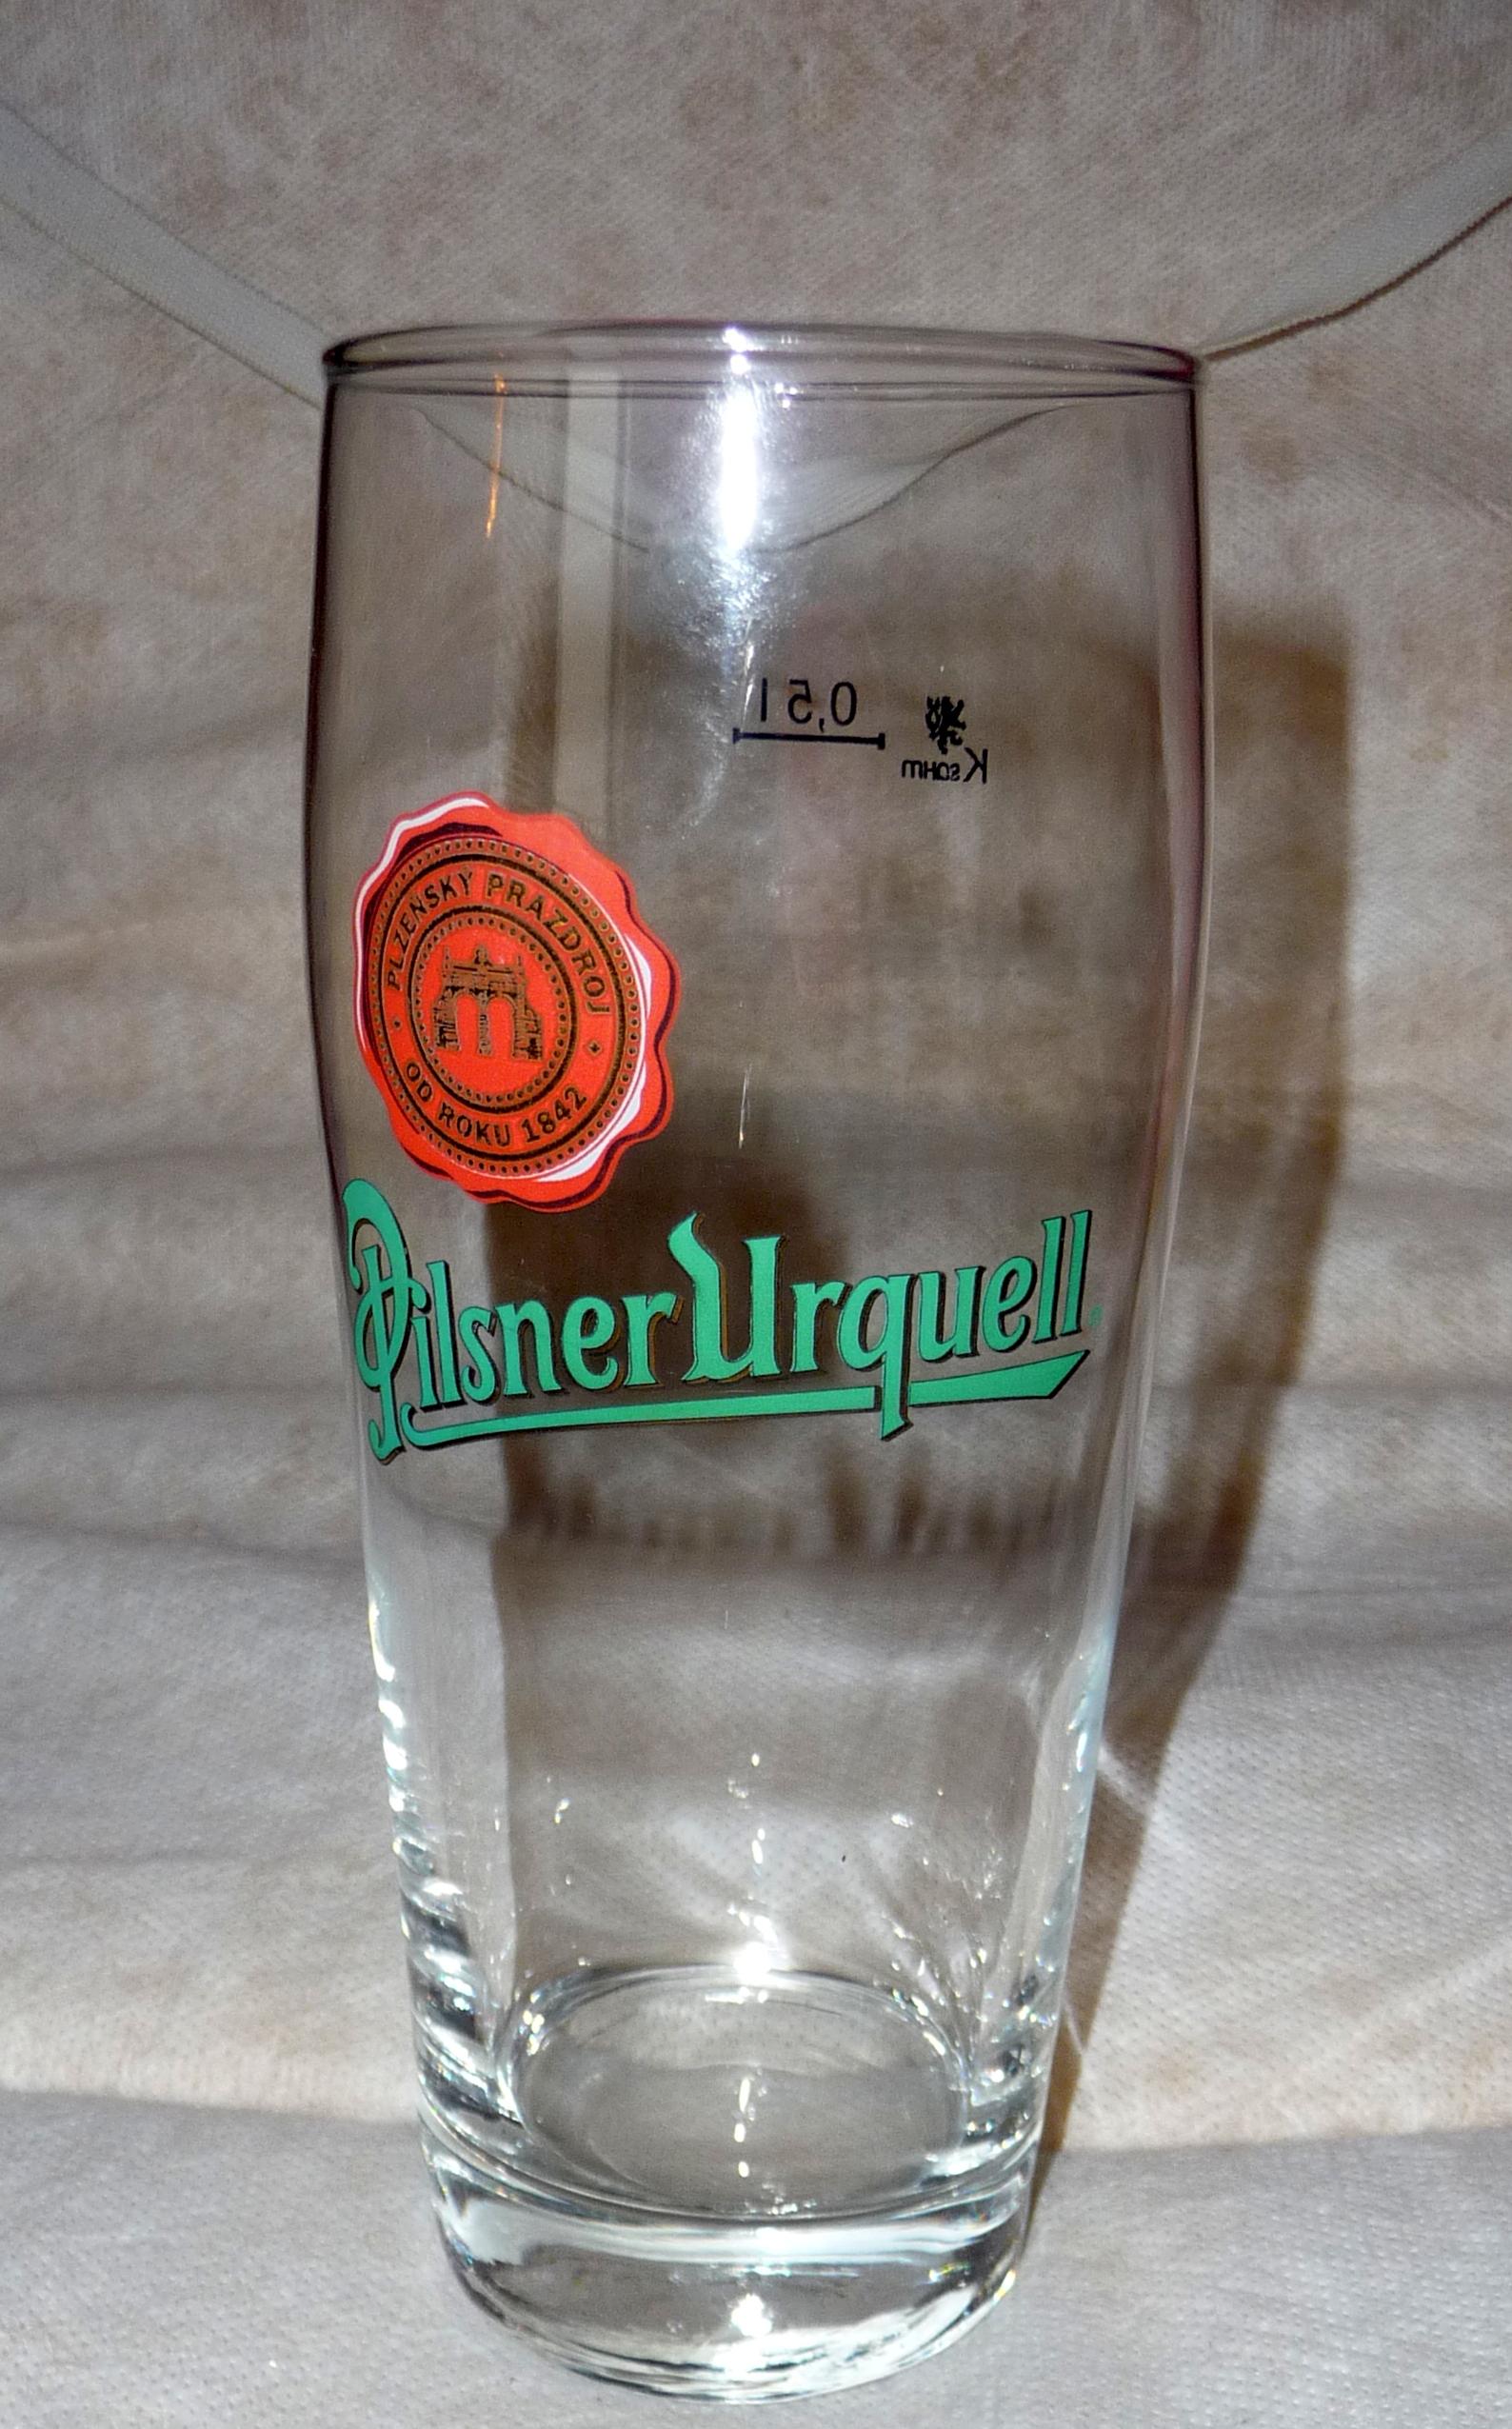 File:Pilsner Urquell beer glass (1) jpg - Wikimedia Commons